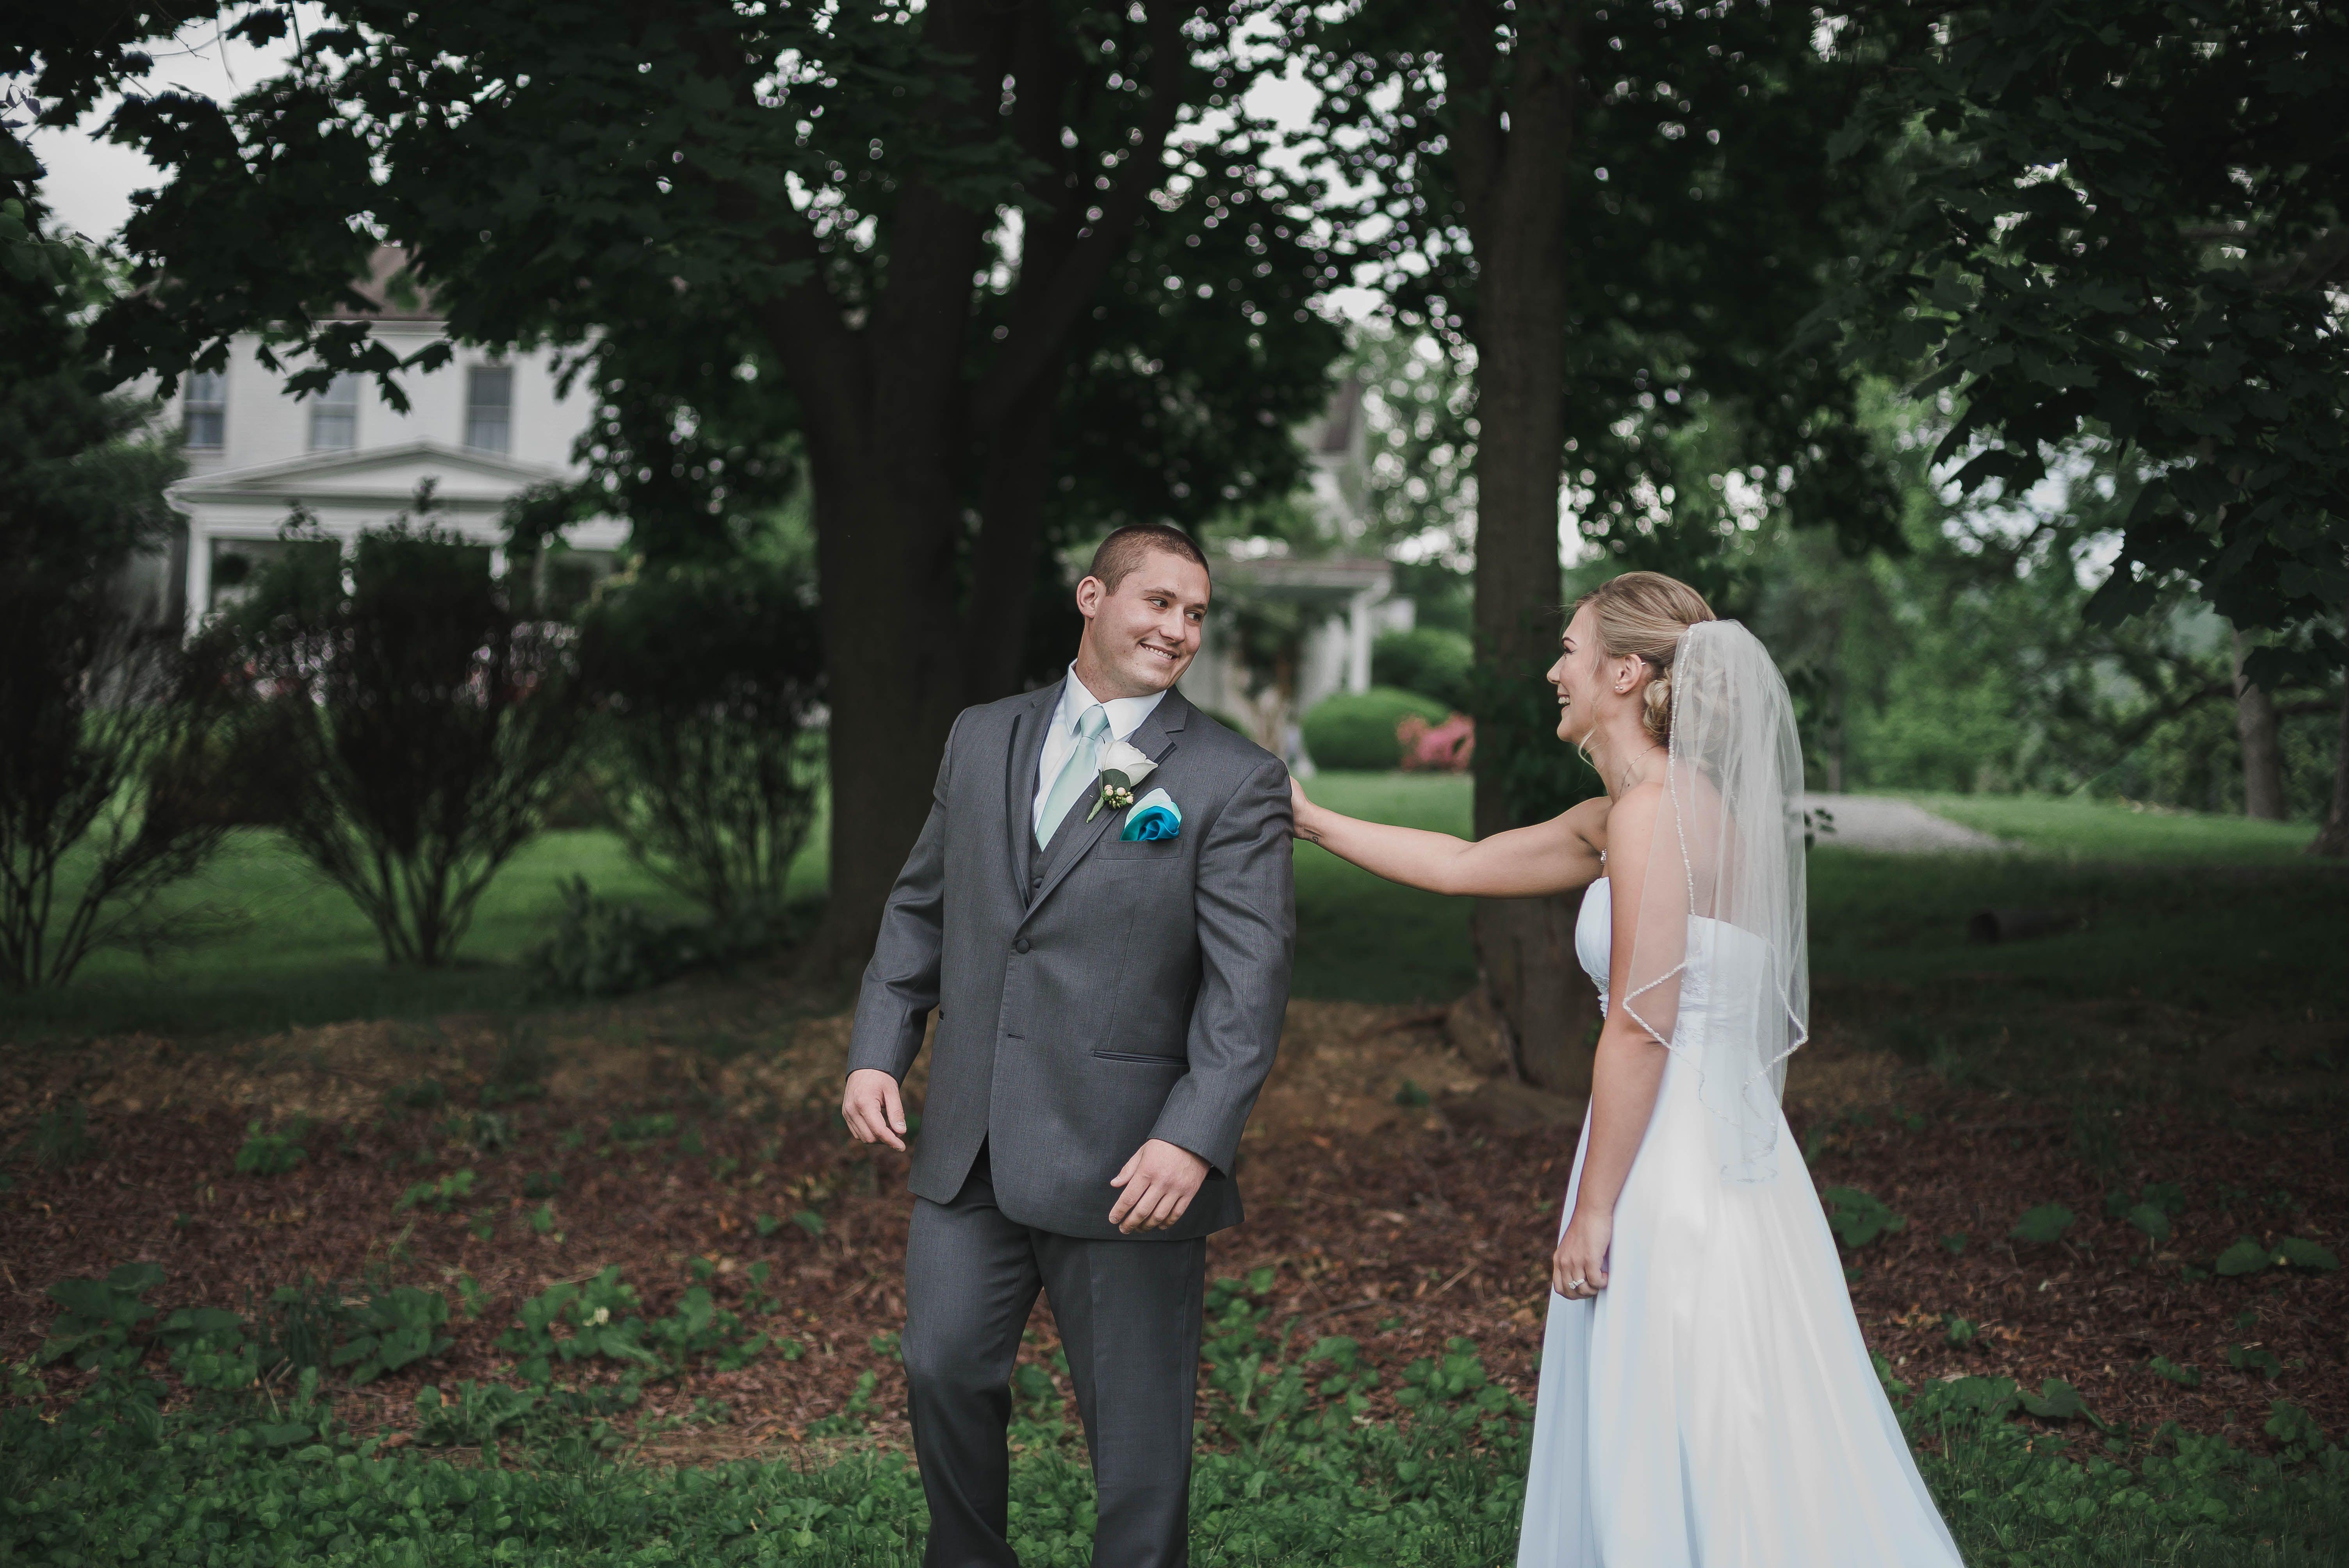 House of amsel photography weddingsengagement pinterest